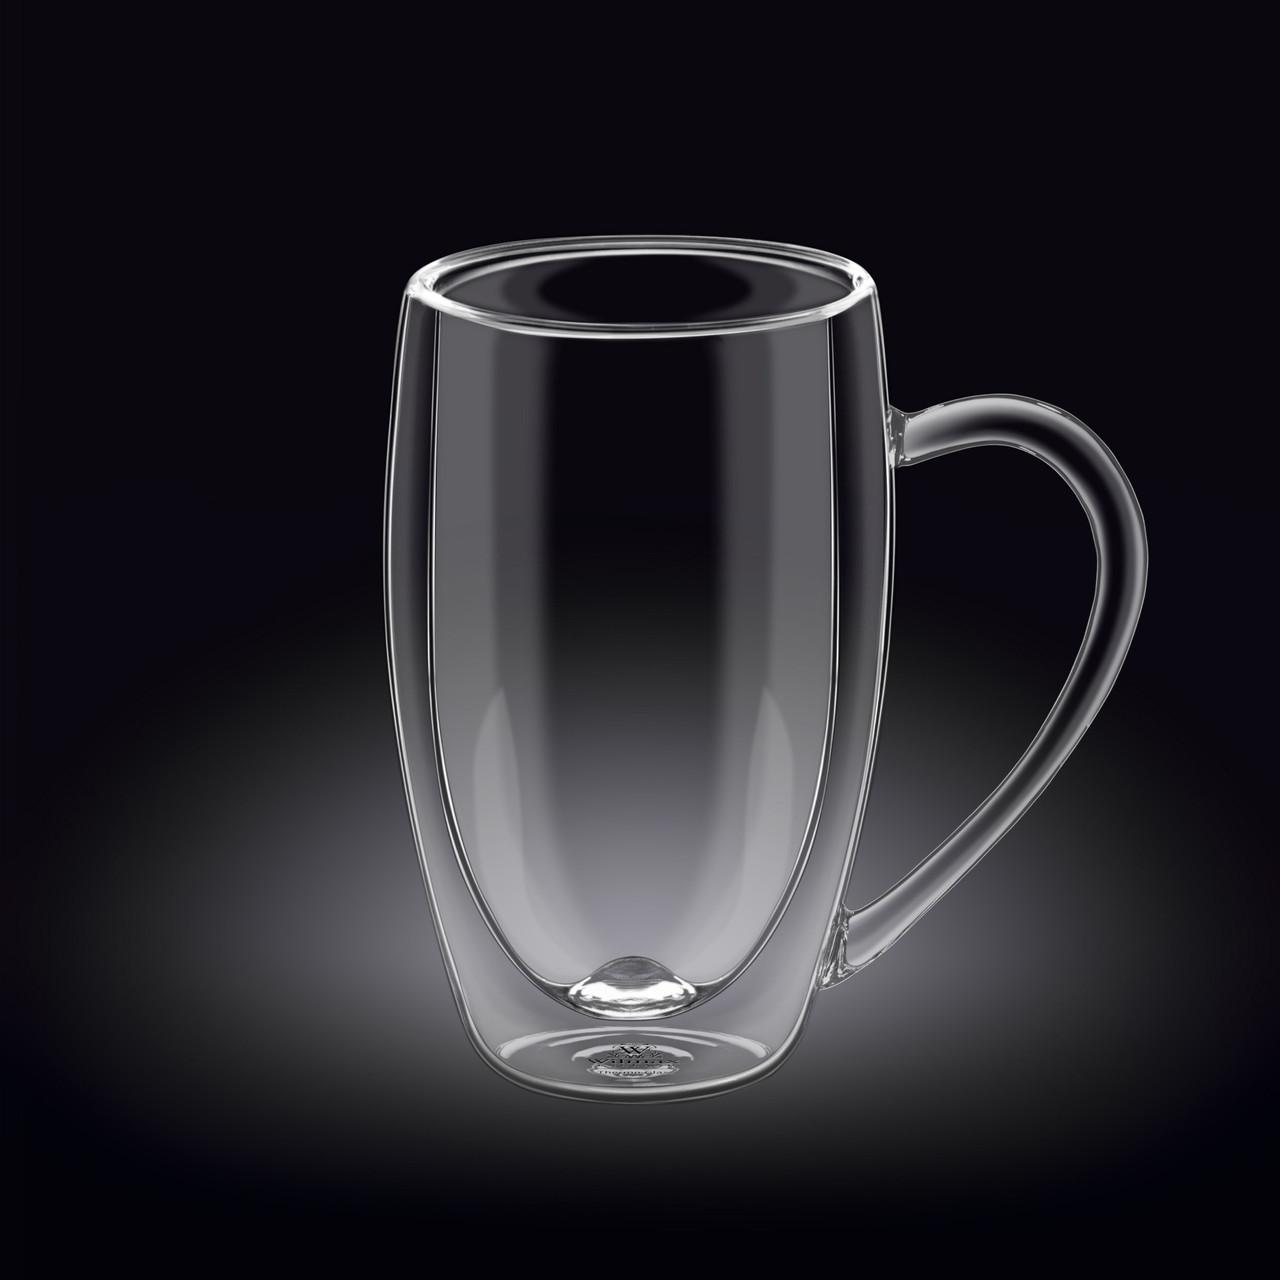 Кружка 400 мл Thermo glass Wilmax с двойными стенками